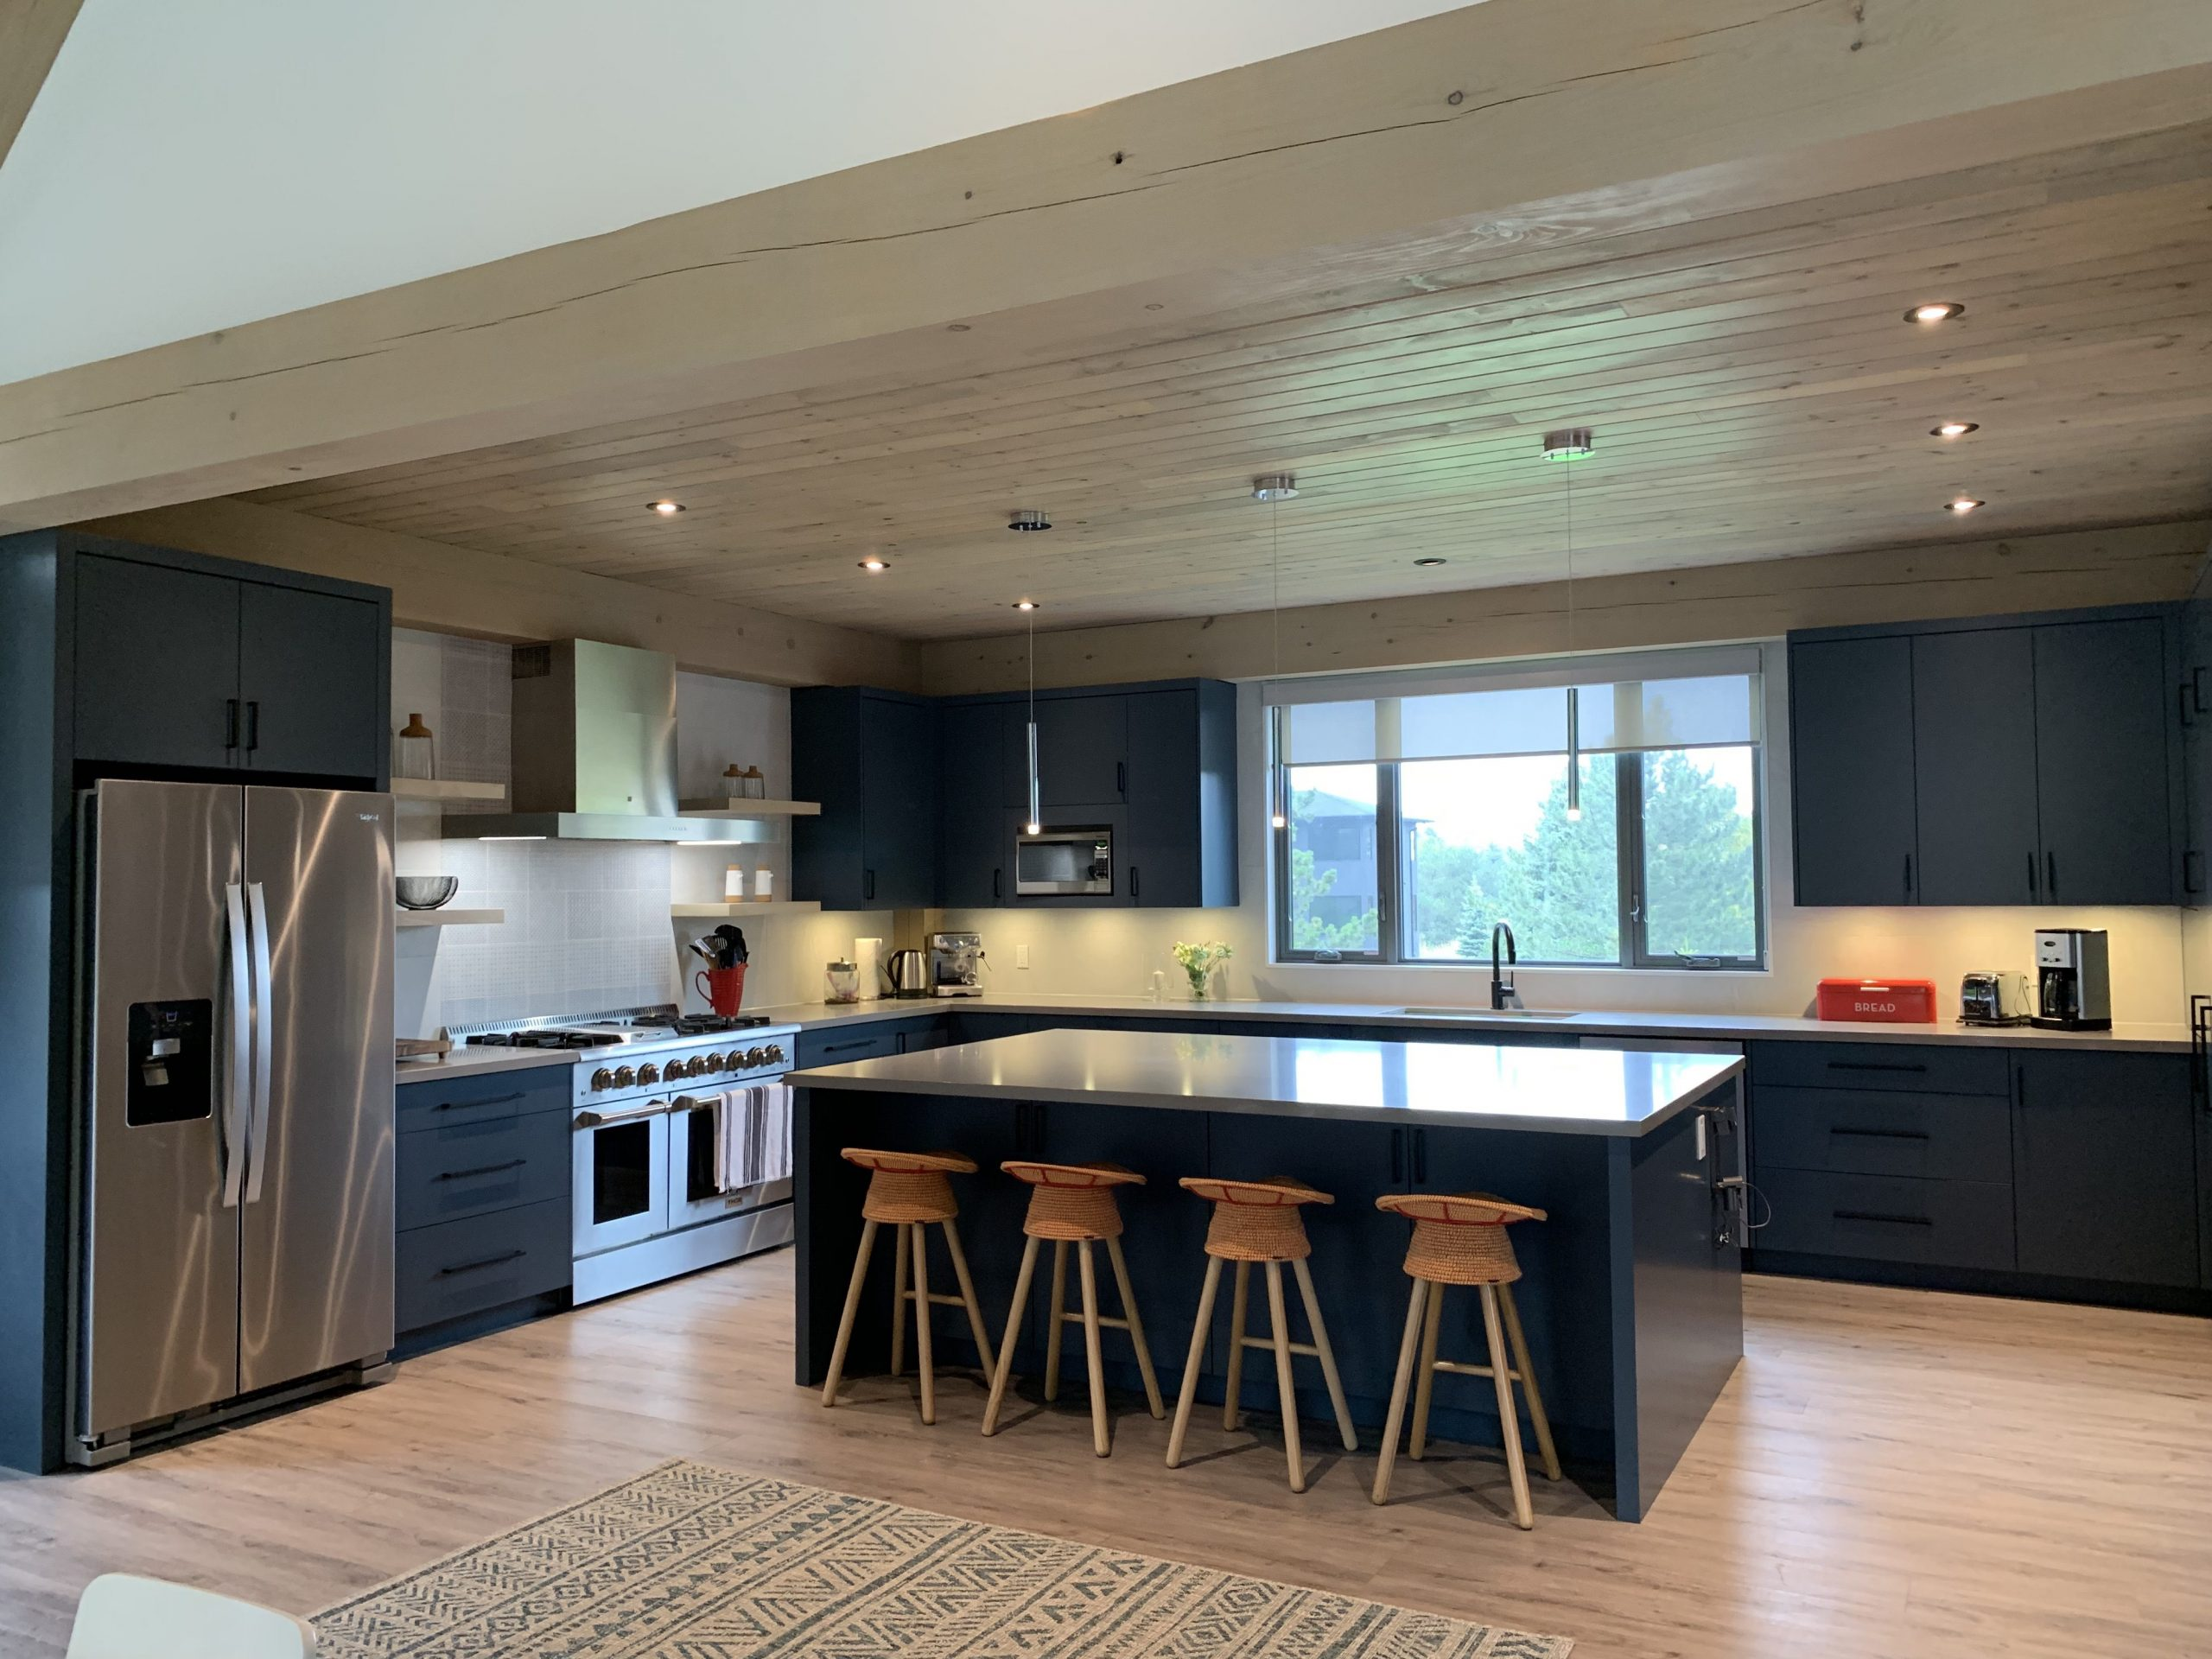 Normerica Timber Frame, Interior, Kitchen, Open Concept, Modern, Contemporary